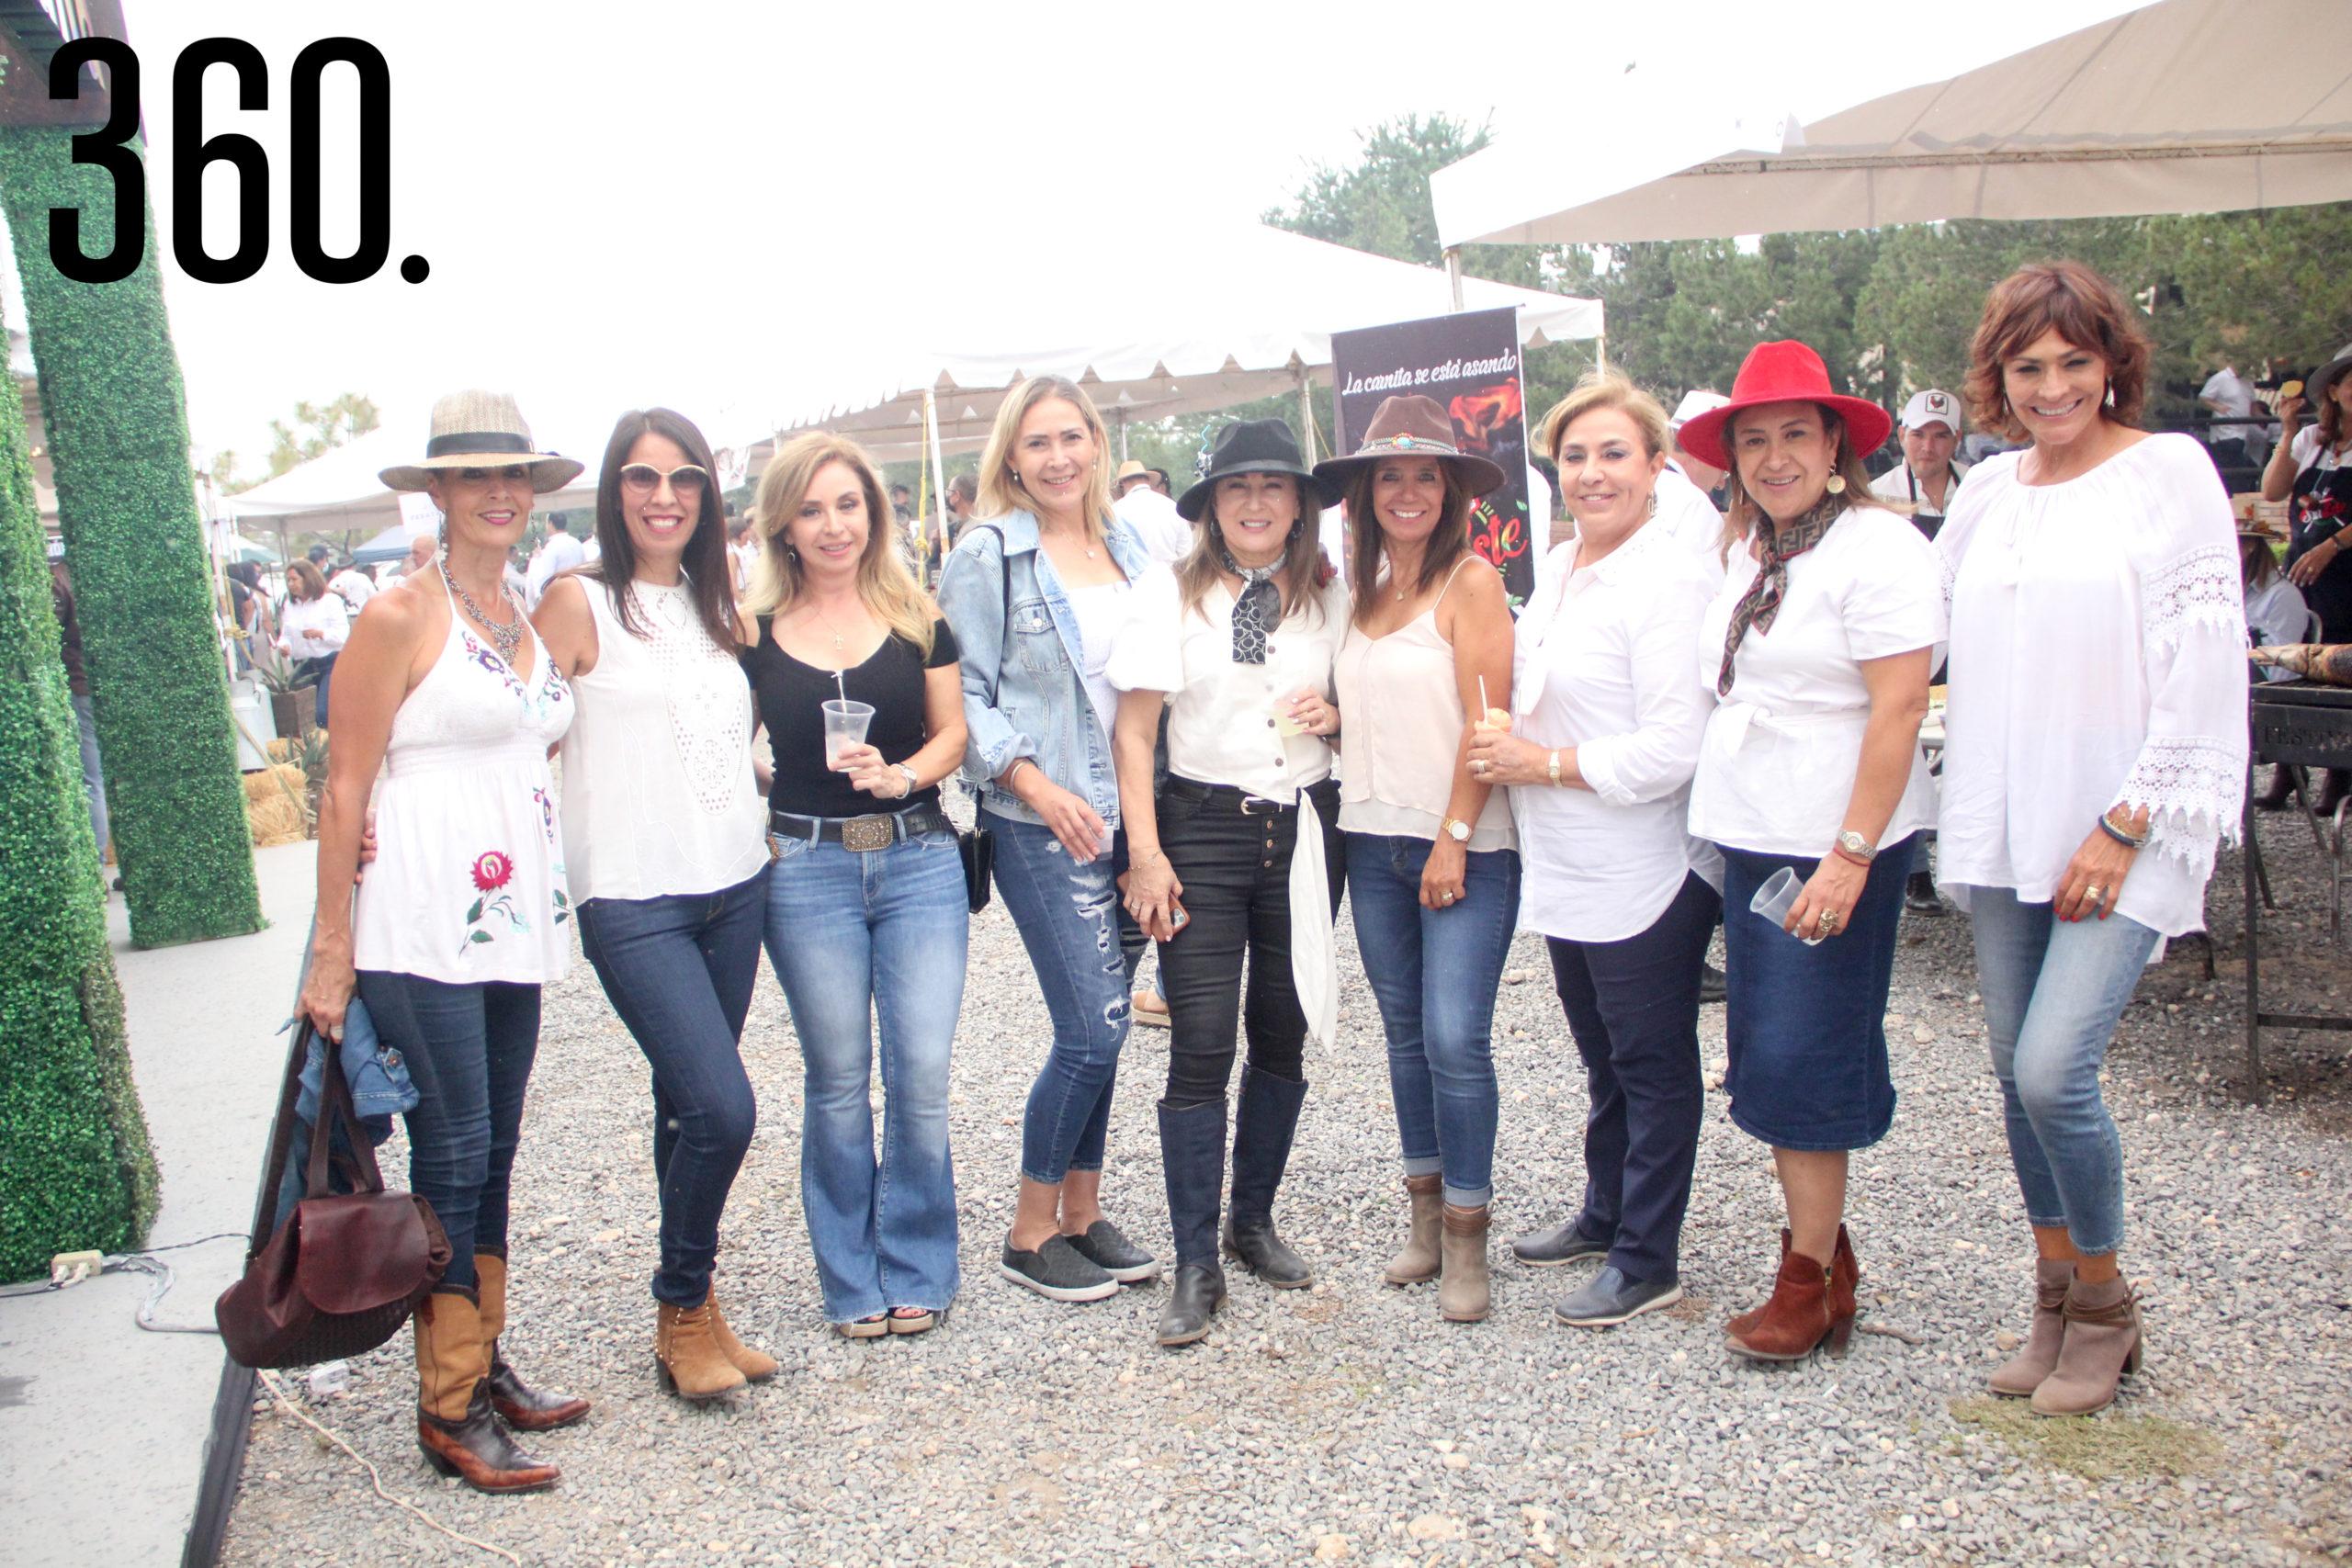 Lorena Lacarra, Emma Salazar, Betty Valdés, Catalina Uribe, Cecilia Martínez, Paty Stengel, Imelda González, Luna Sánchez y Olivia Flores.